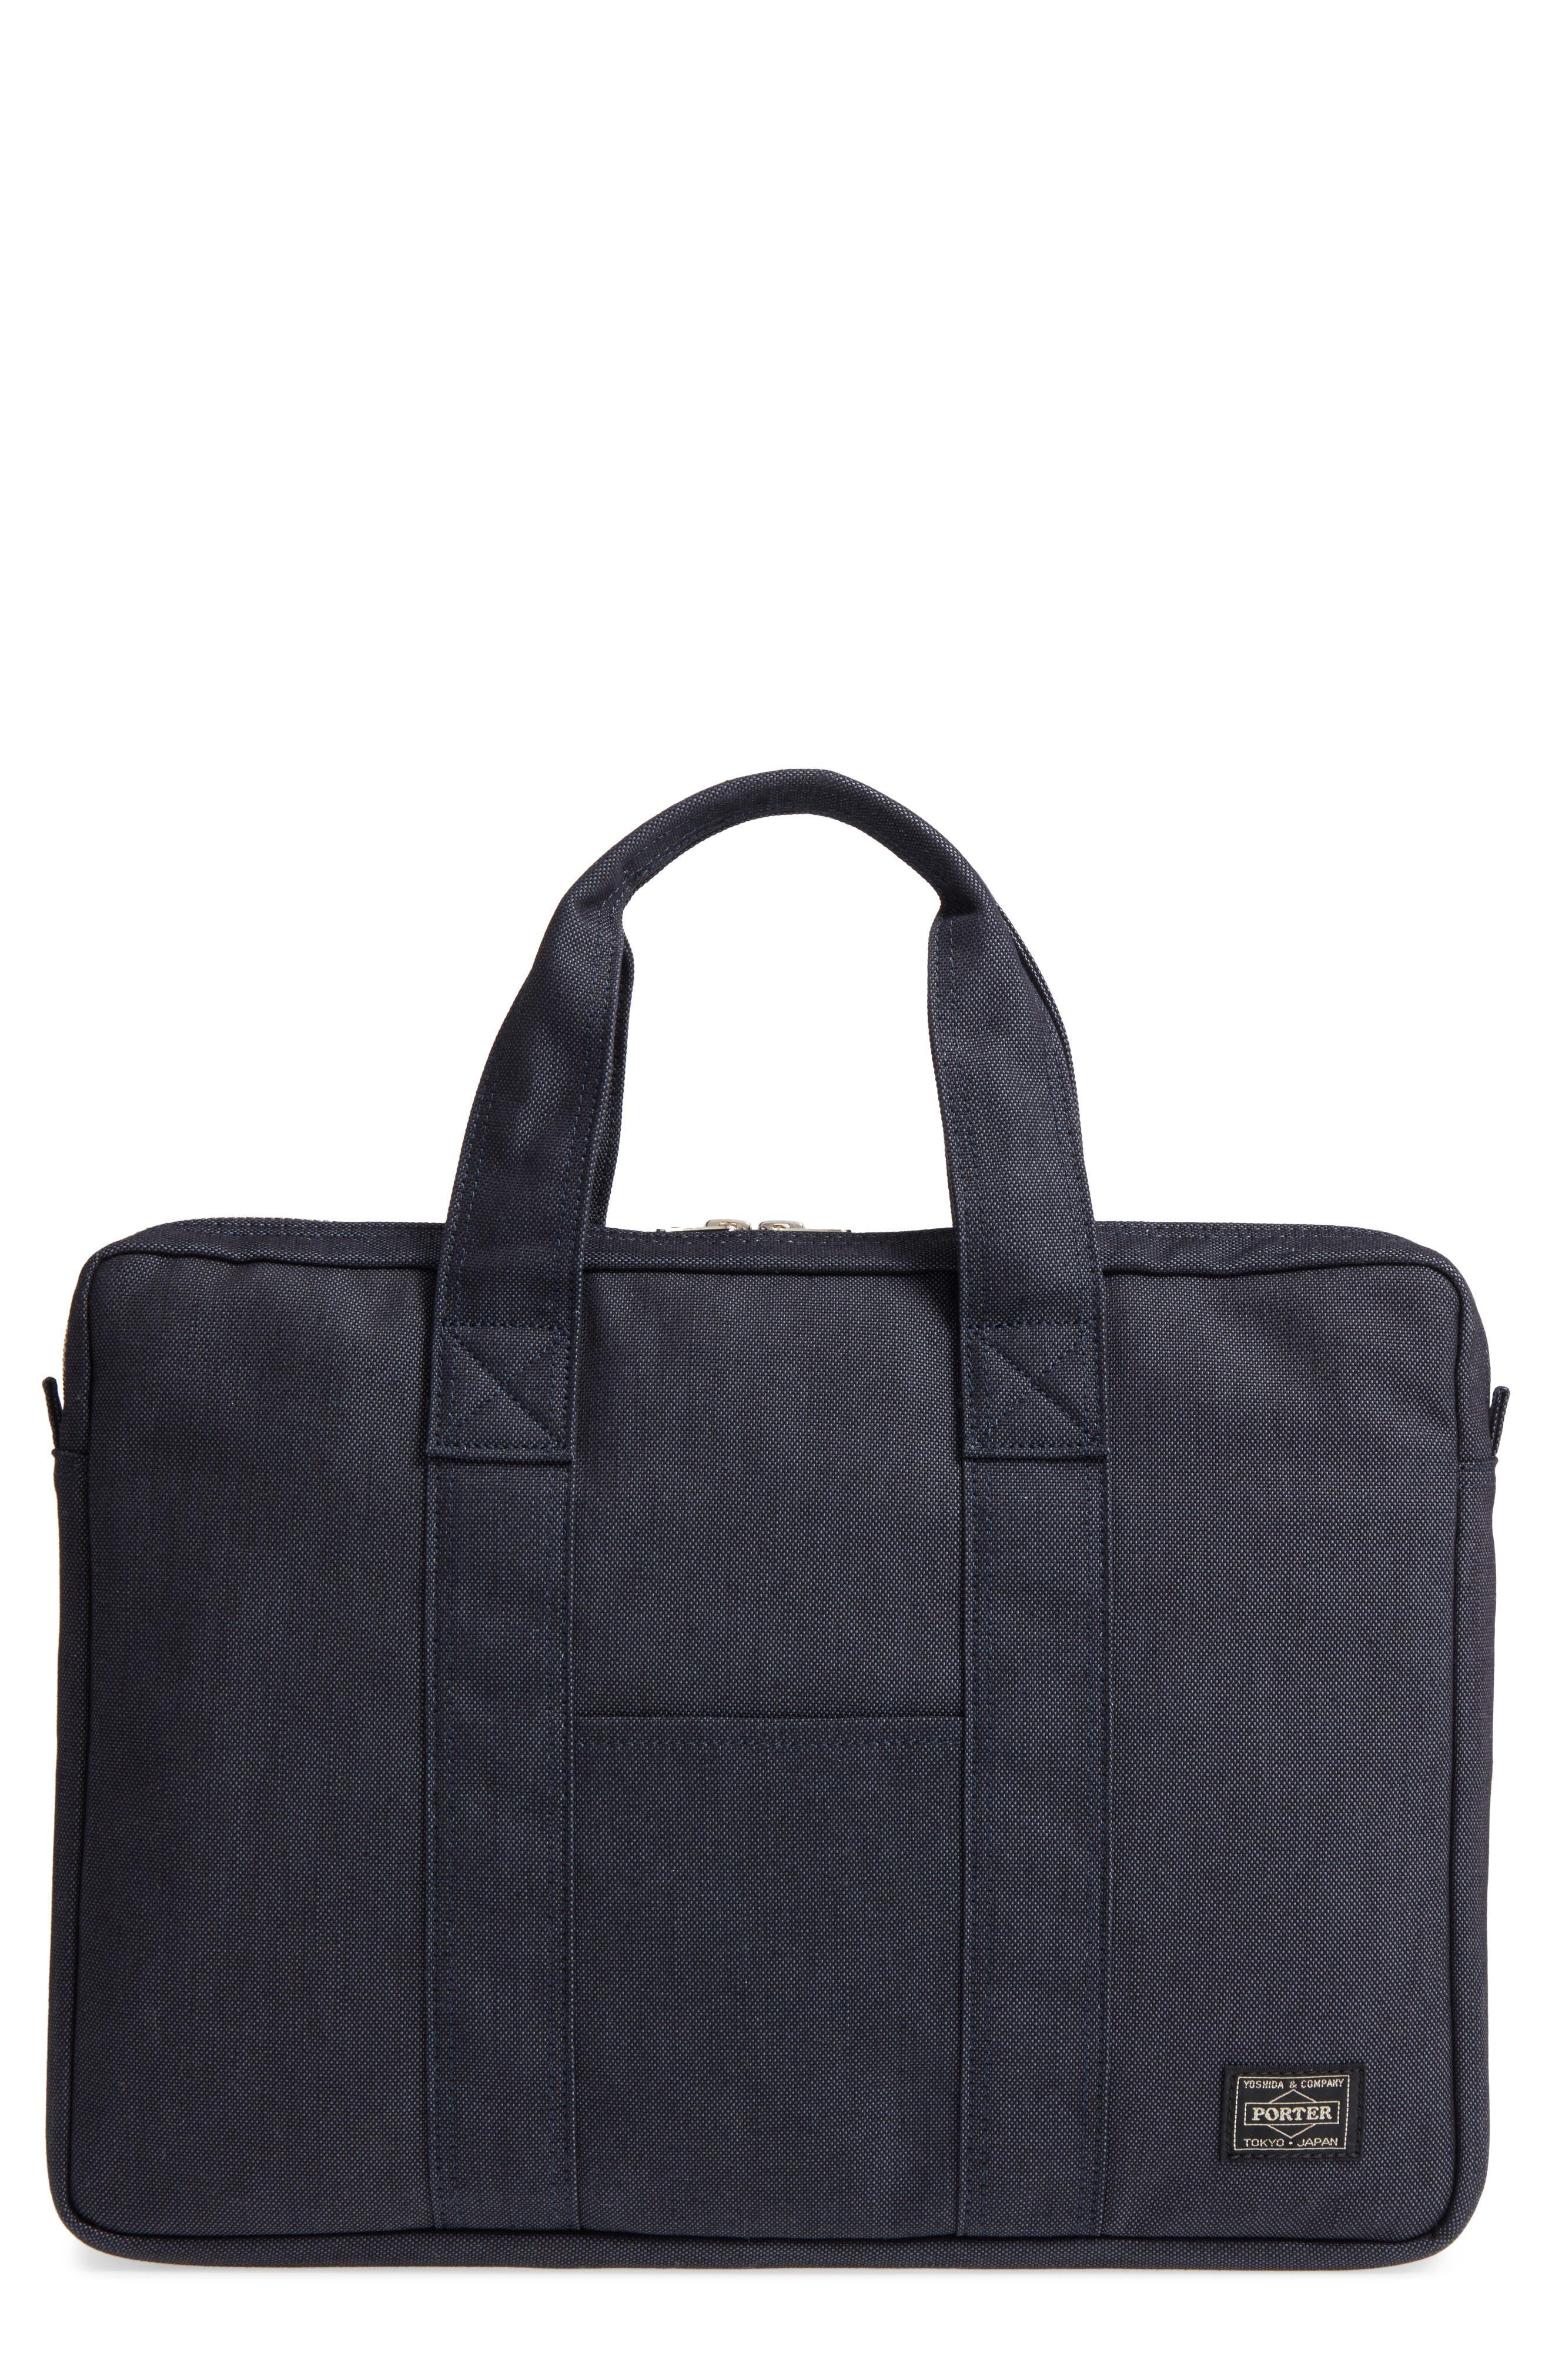 Porter-Yoshida & Co. Smoky Briefcase,                         Main,                         color, 400